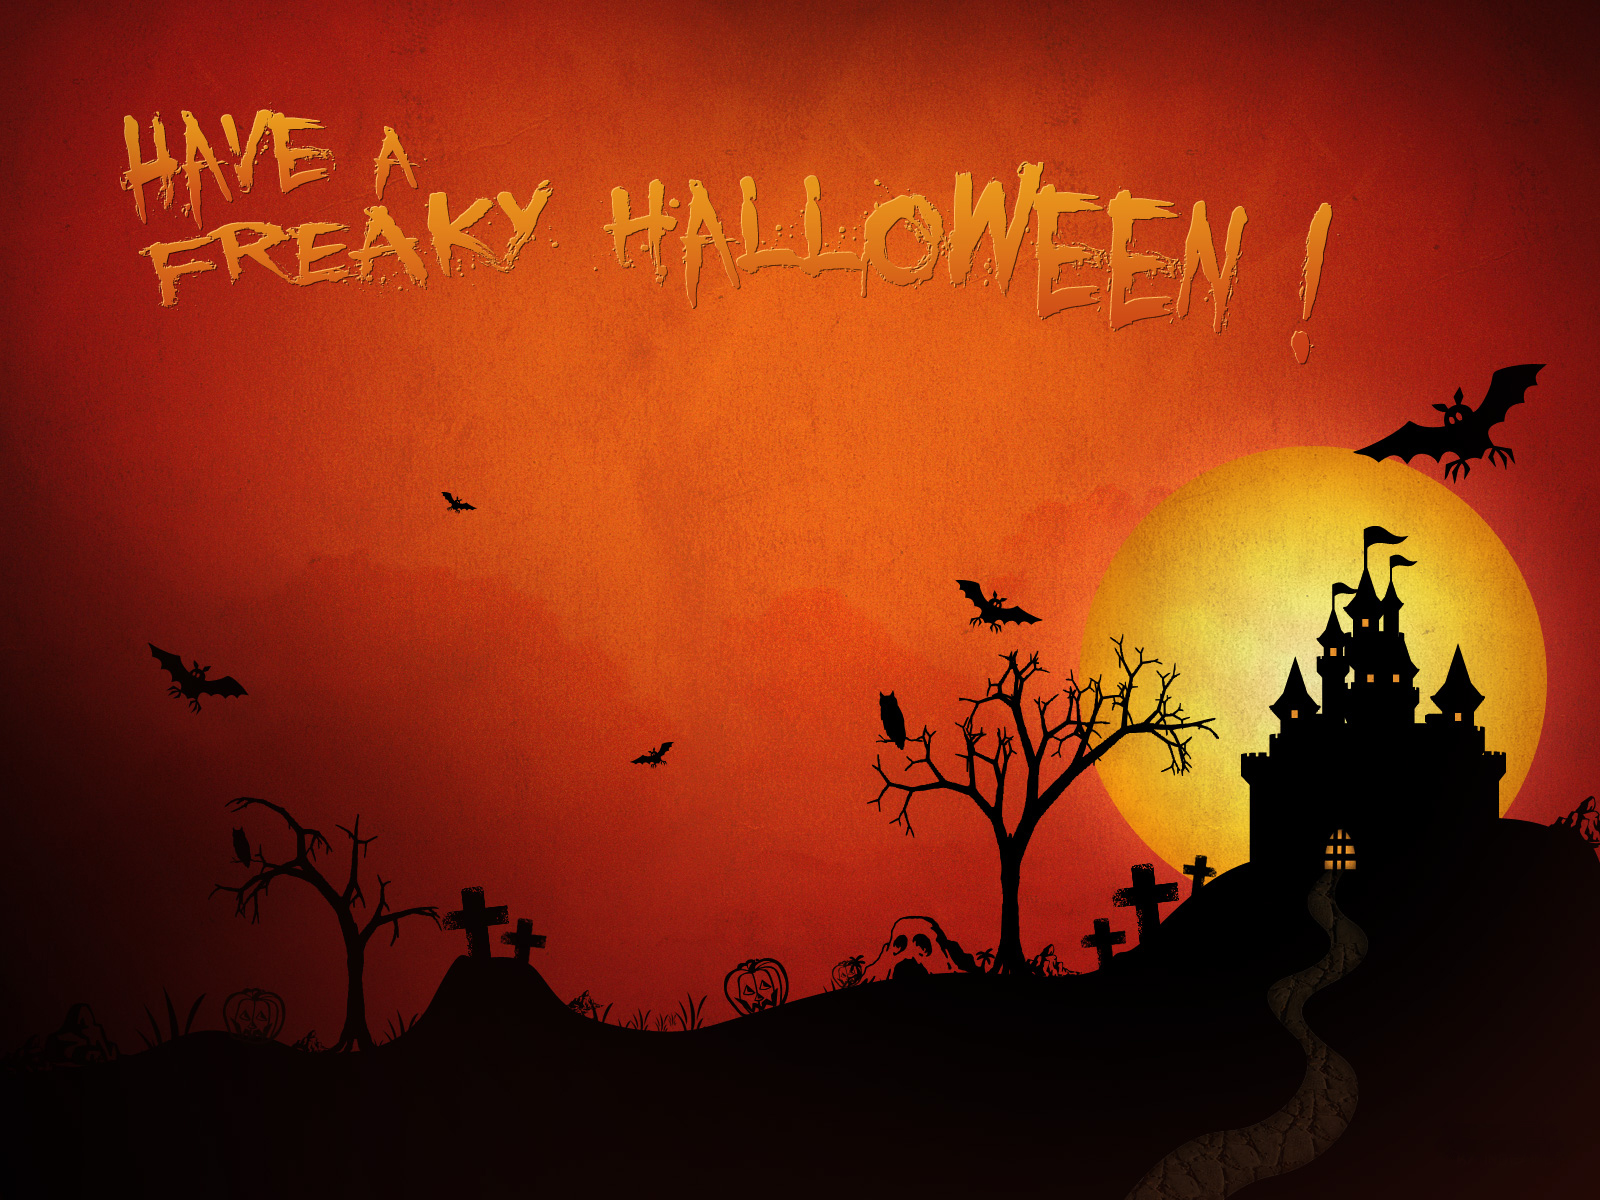 Halloween Pc Wallpaper Free - WallpaperSafari